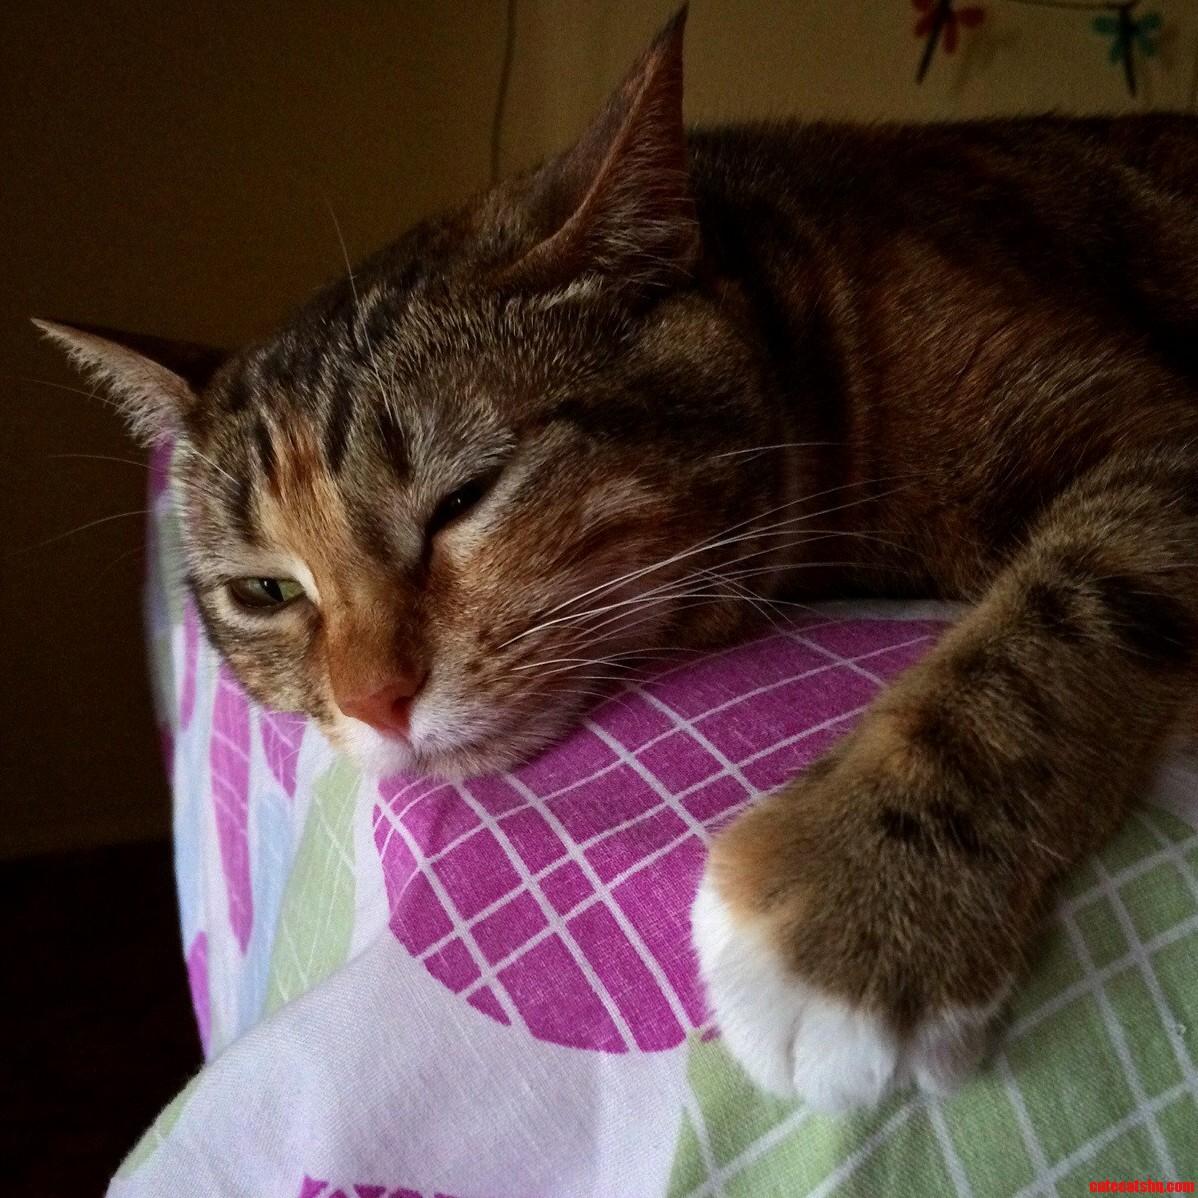 Sakura Hates Mondays As Much As Humans Do.